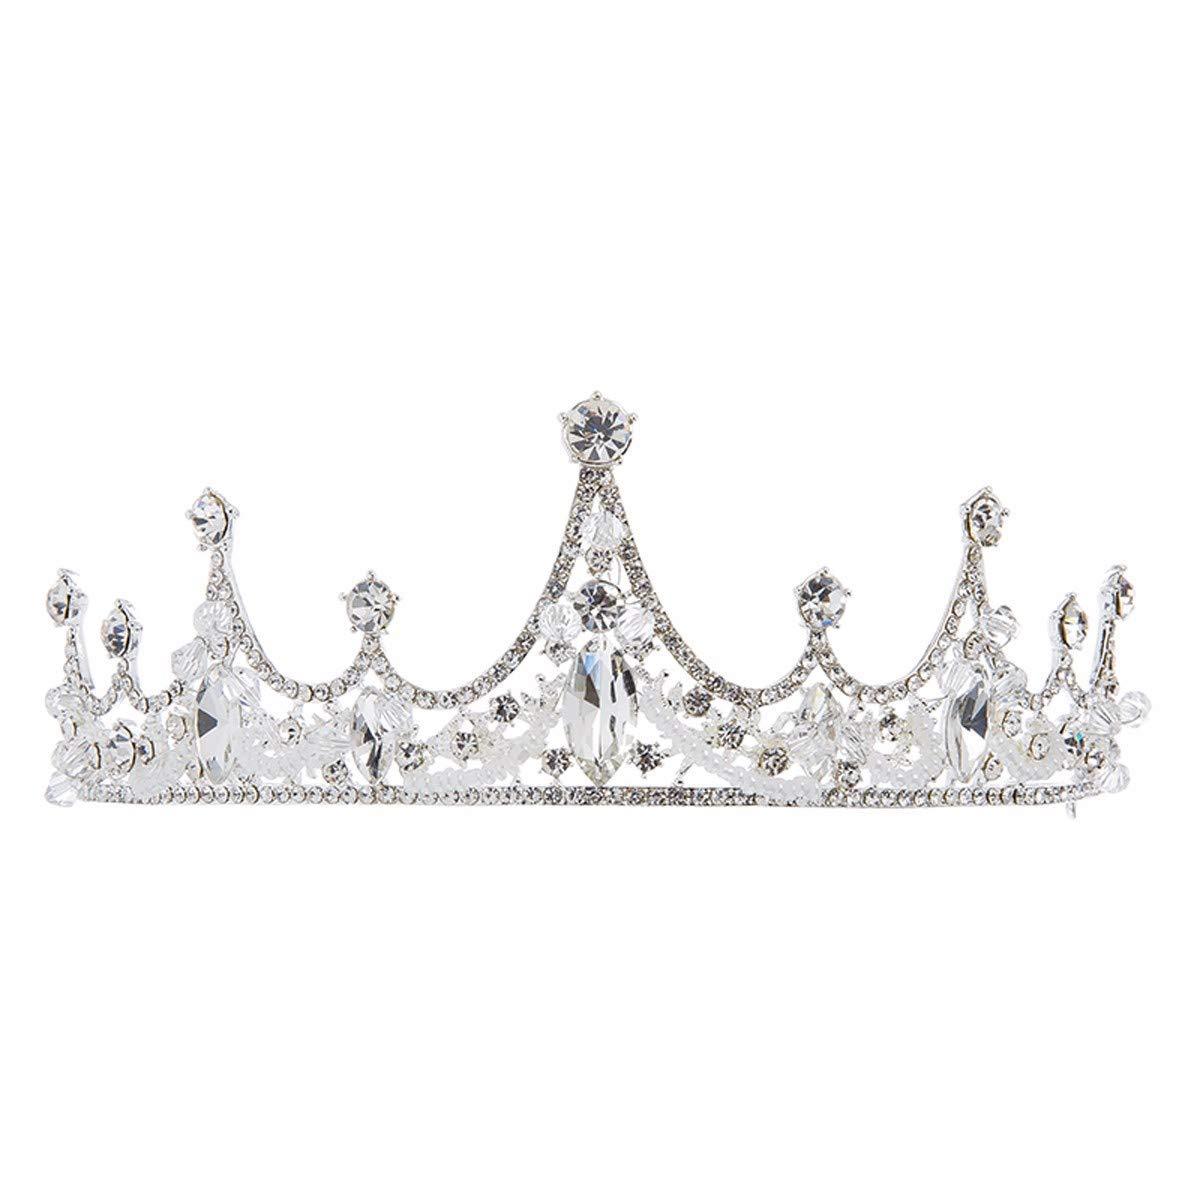 Girls Crown, Beautiful headdress/Crown Headwear Bridal Ornaments Wedding Accessories Crystal Ornaments.